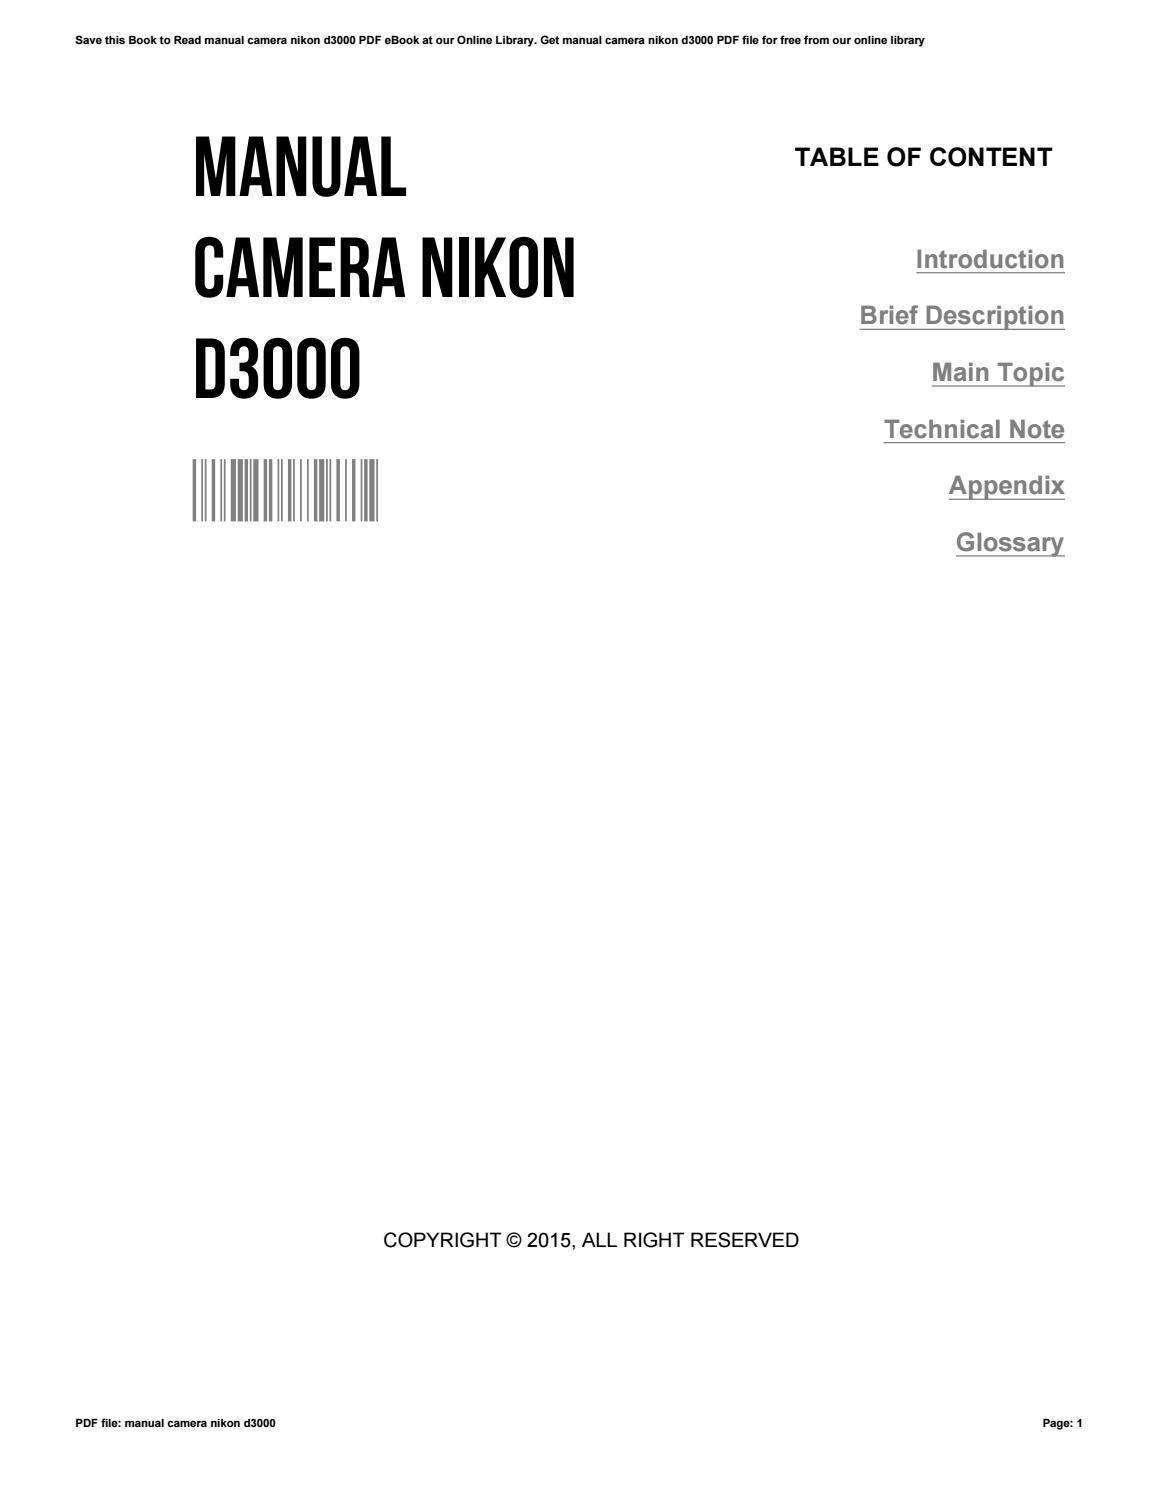 Manual camera nikon d3000 by sylviaknaack4572 issuu baditri Images